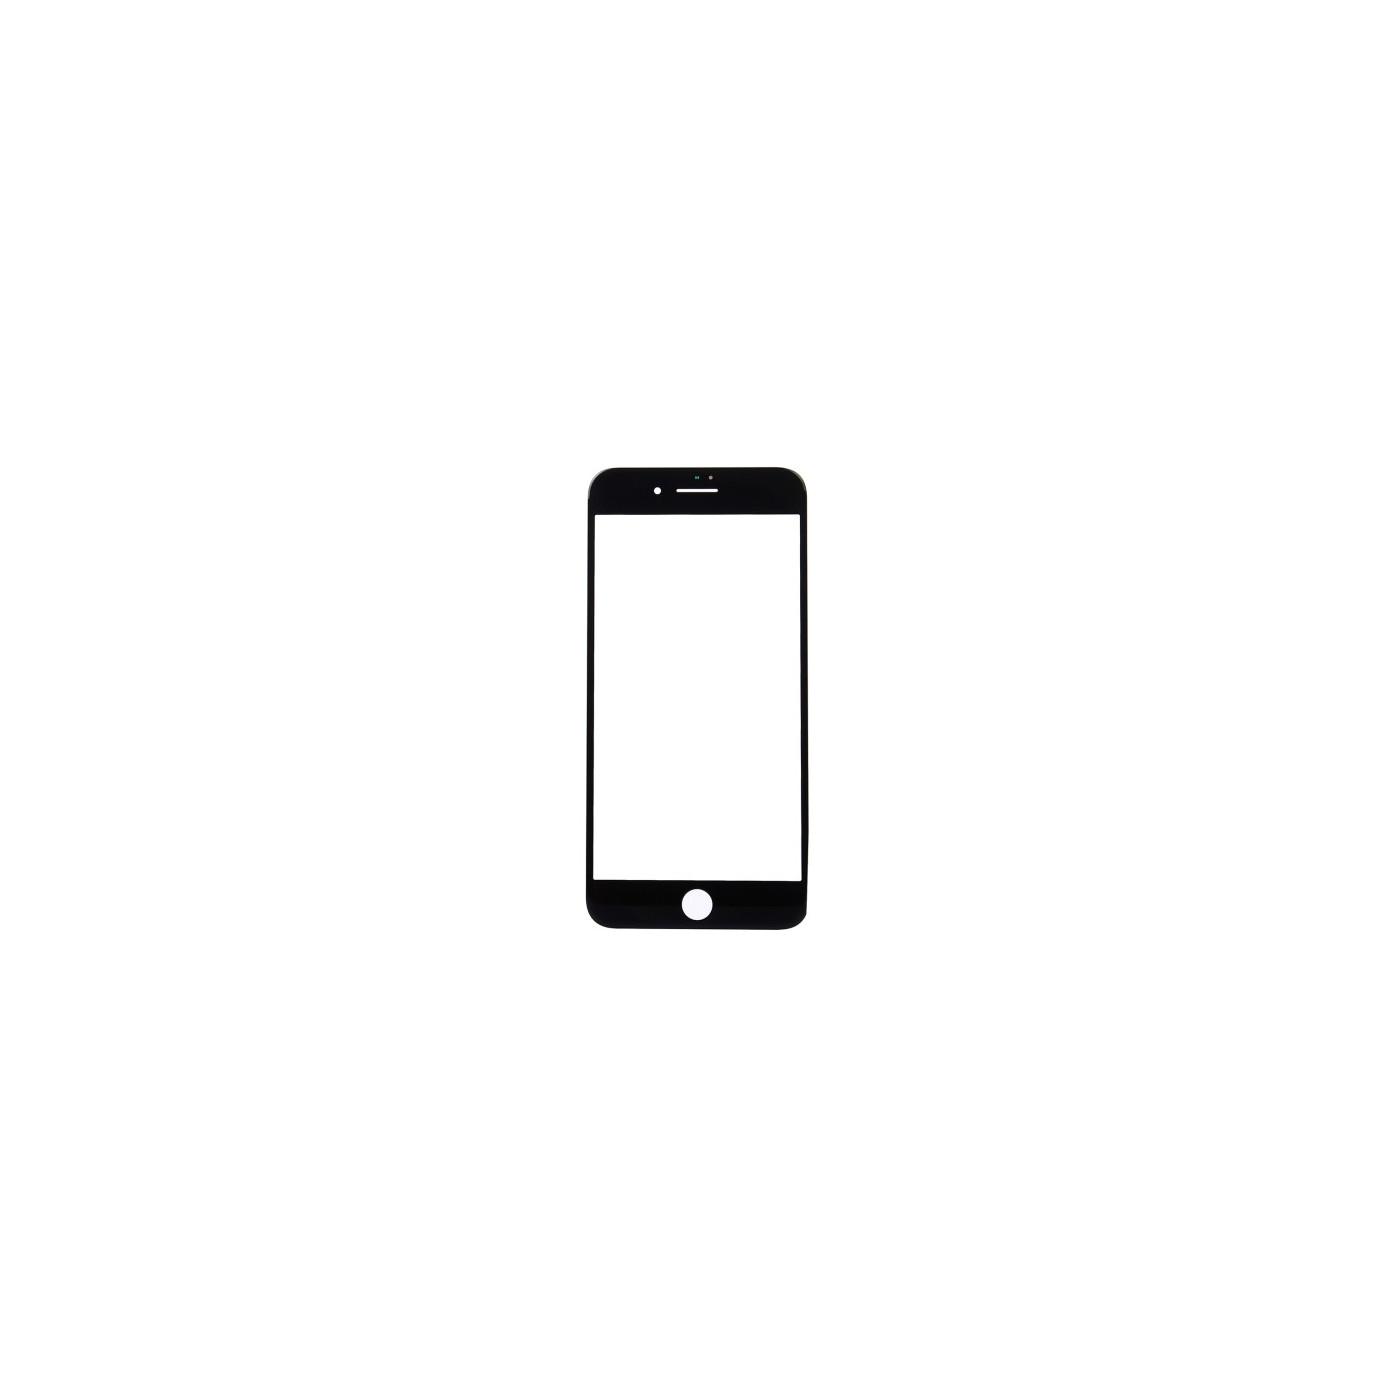 Vidrio frontal de vidrio para apple iphone 7 PLUS pantalla táctil negra